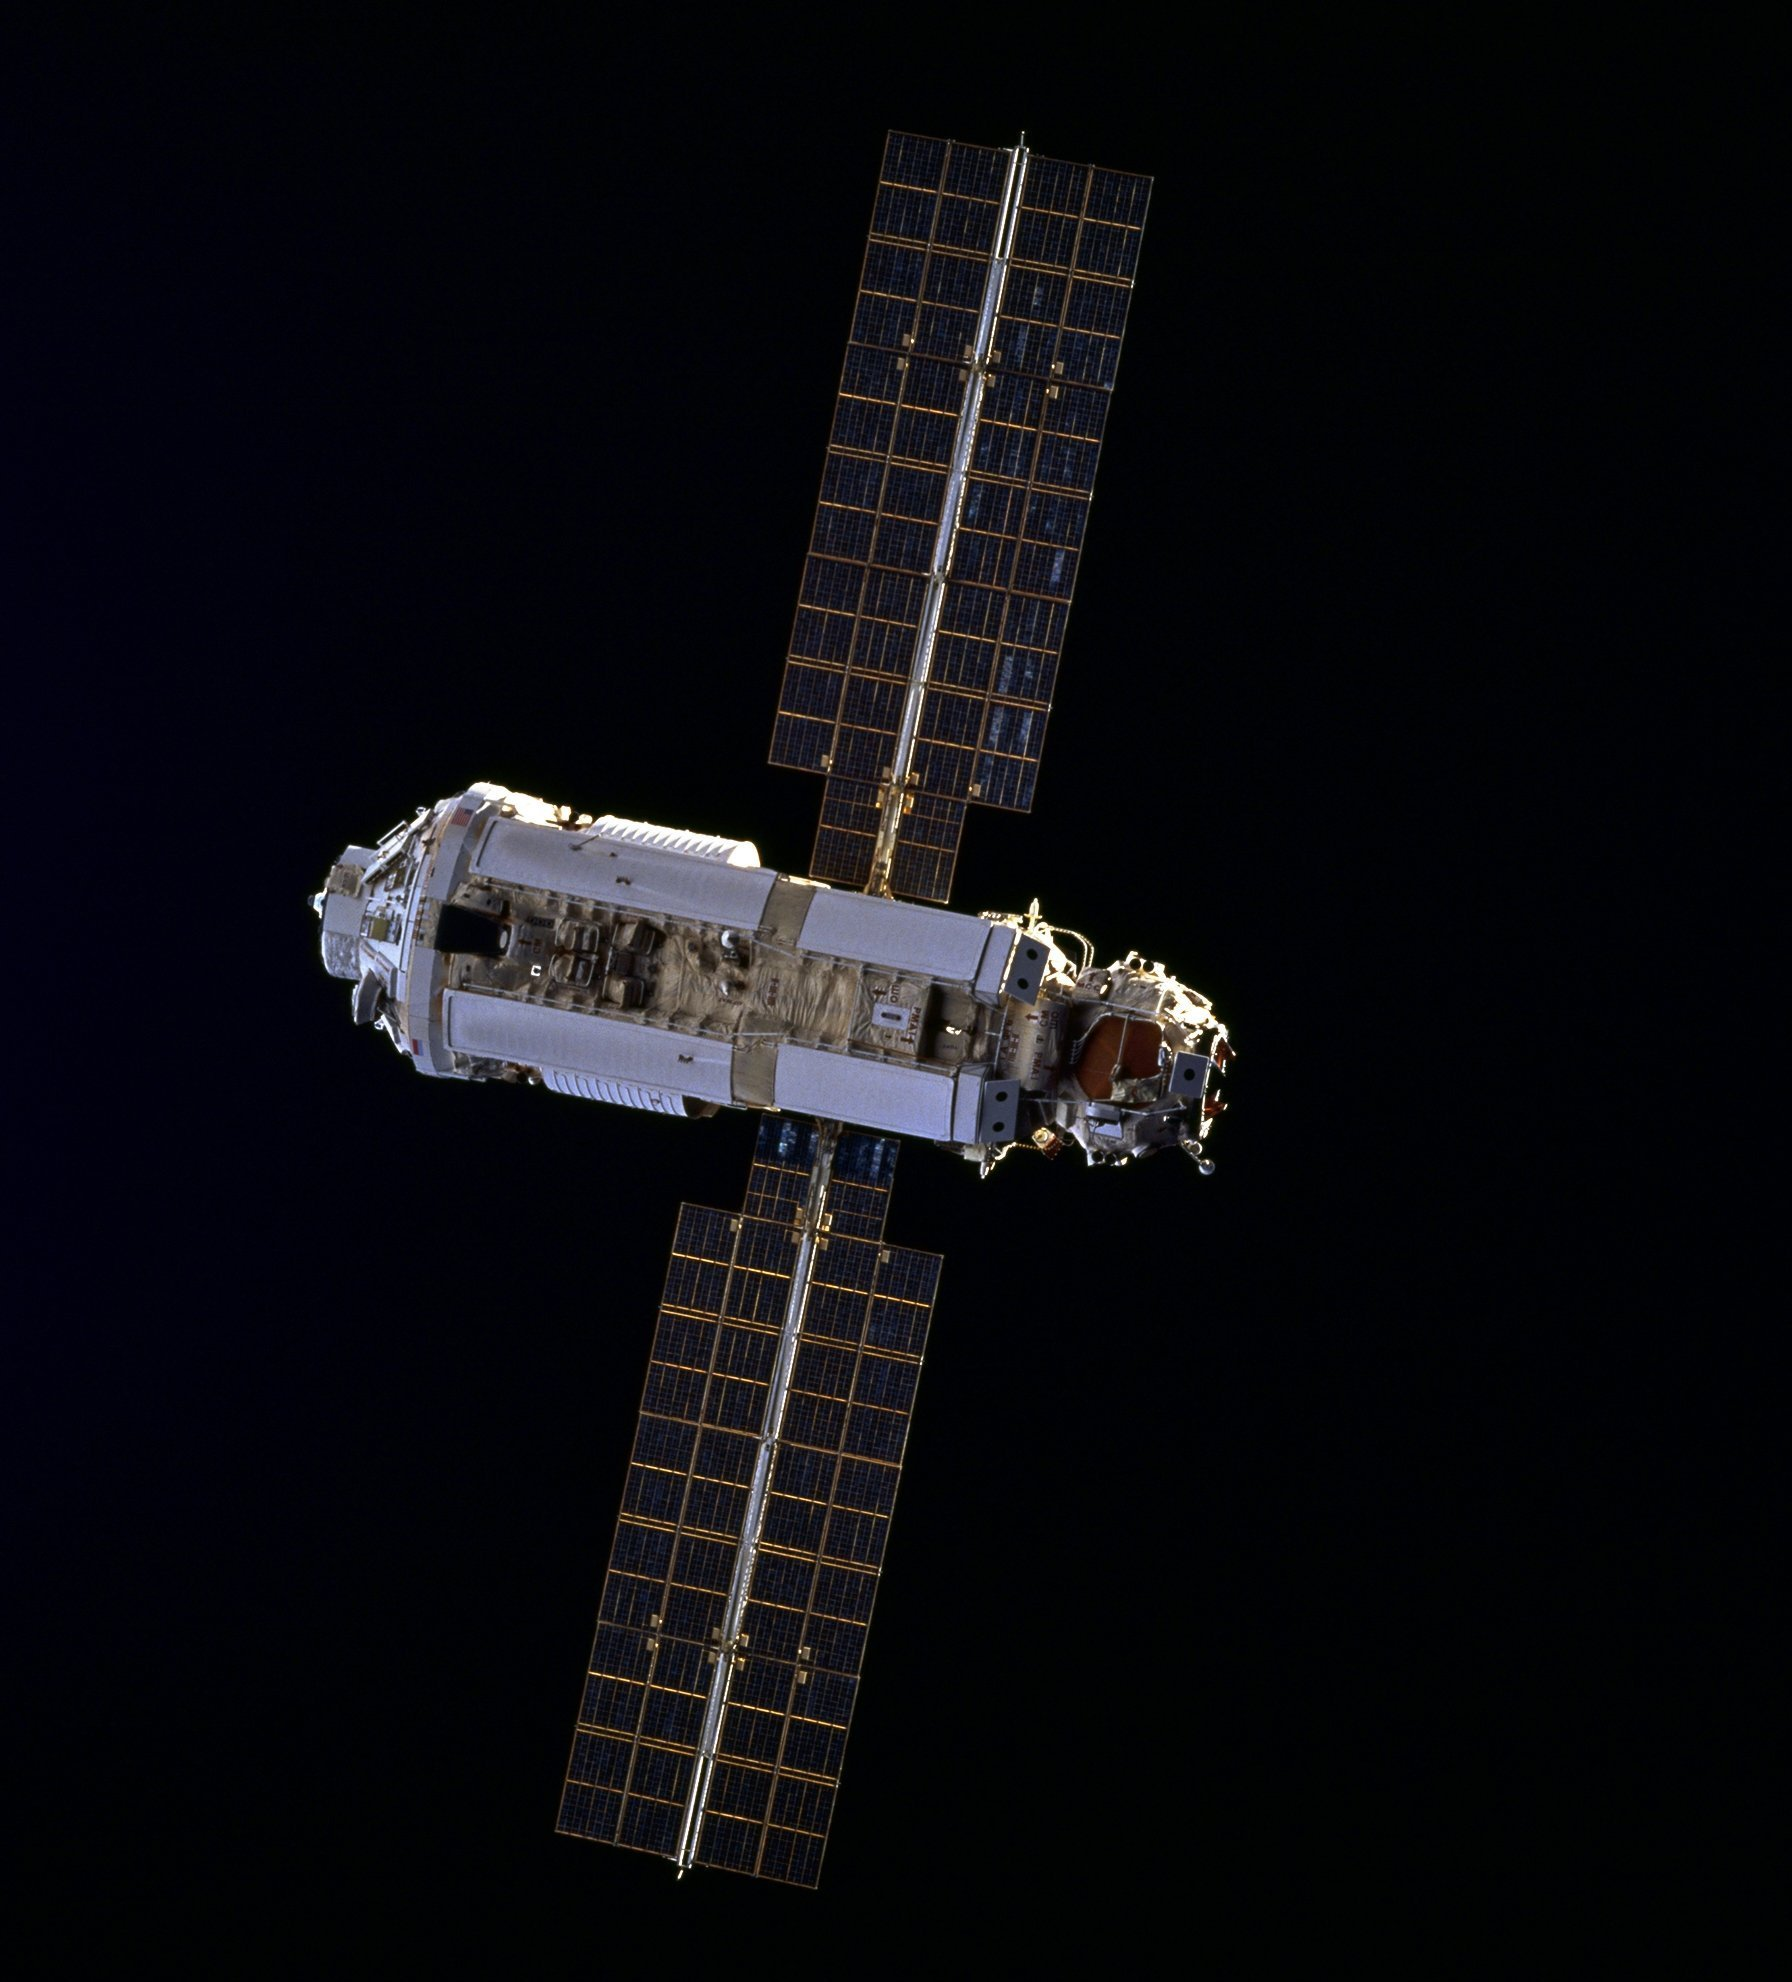 ISS Zarya module as seen from STS-88 (NASA)